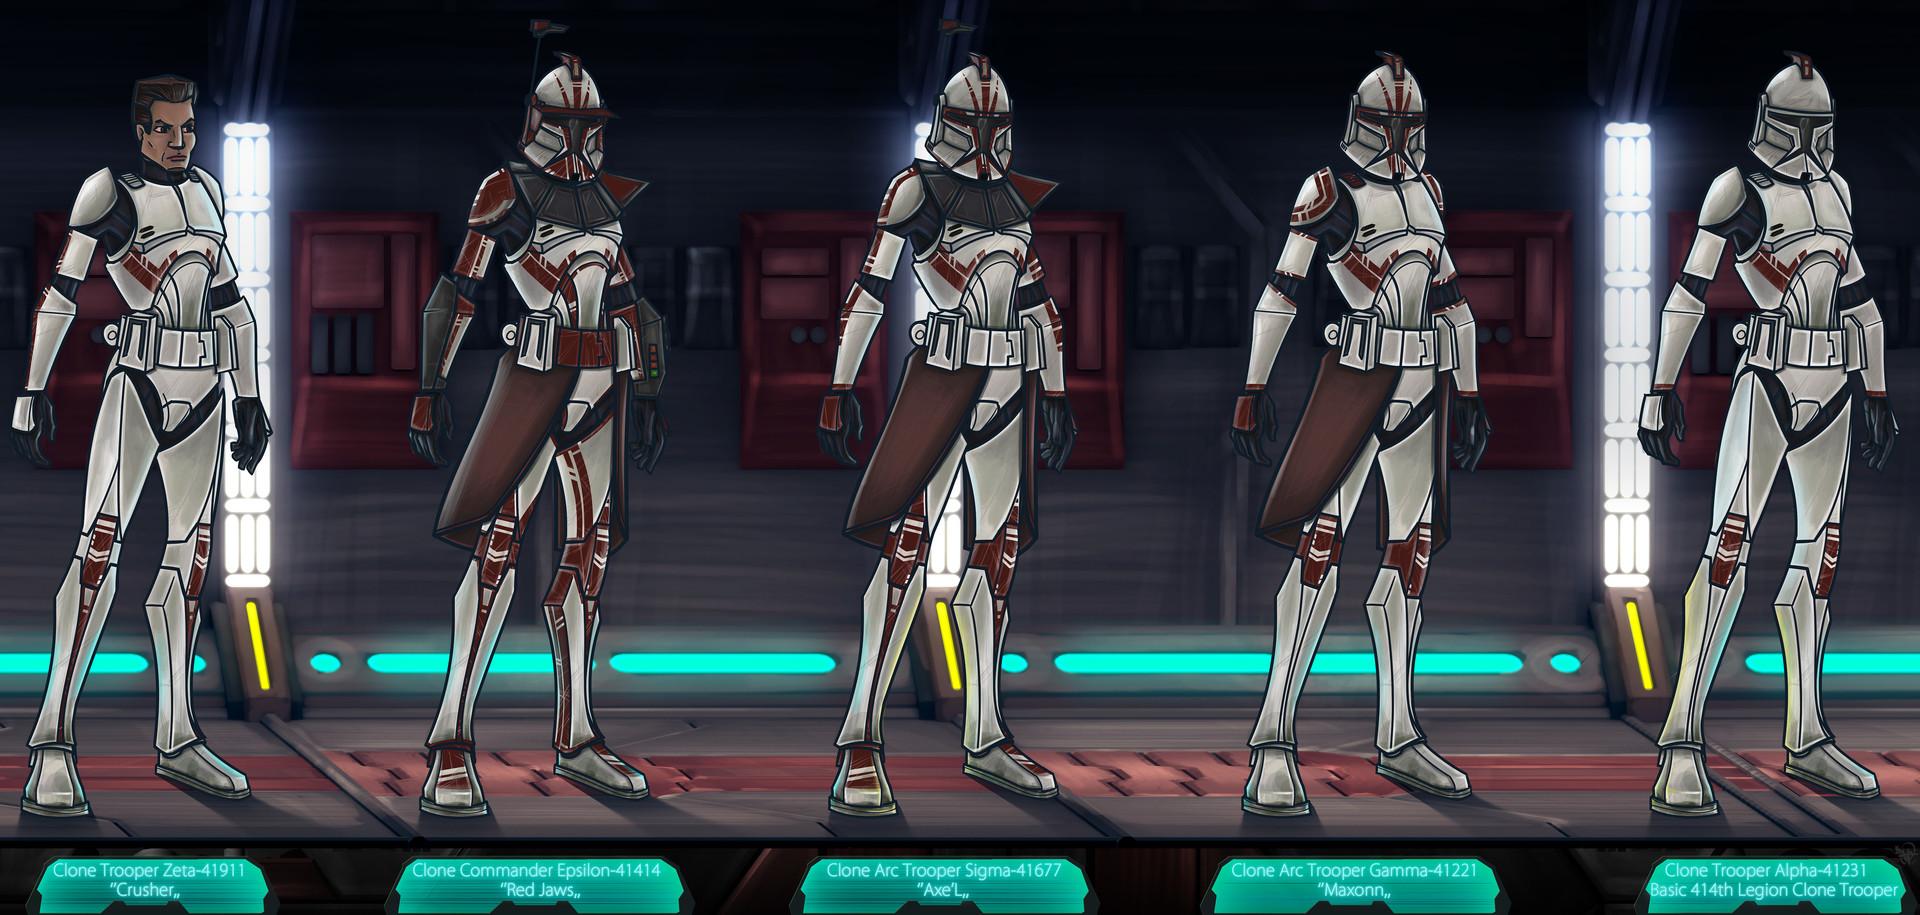 Etienne beschet 414th legion clone troopers